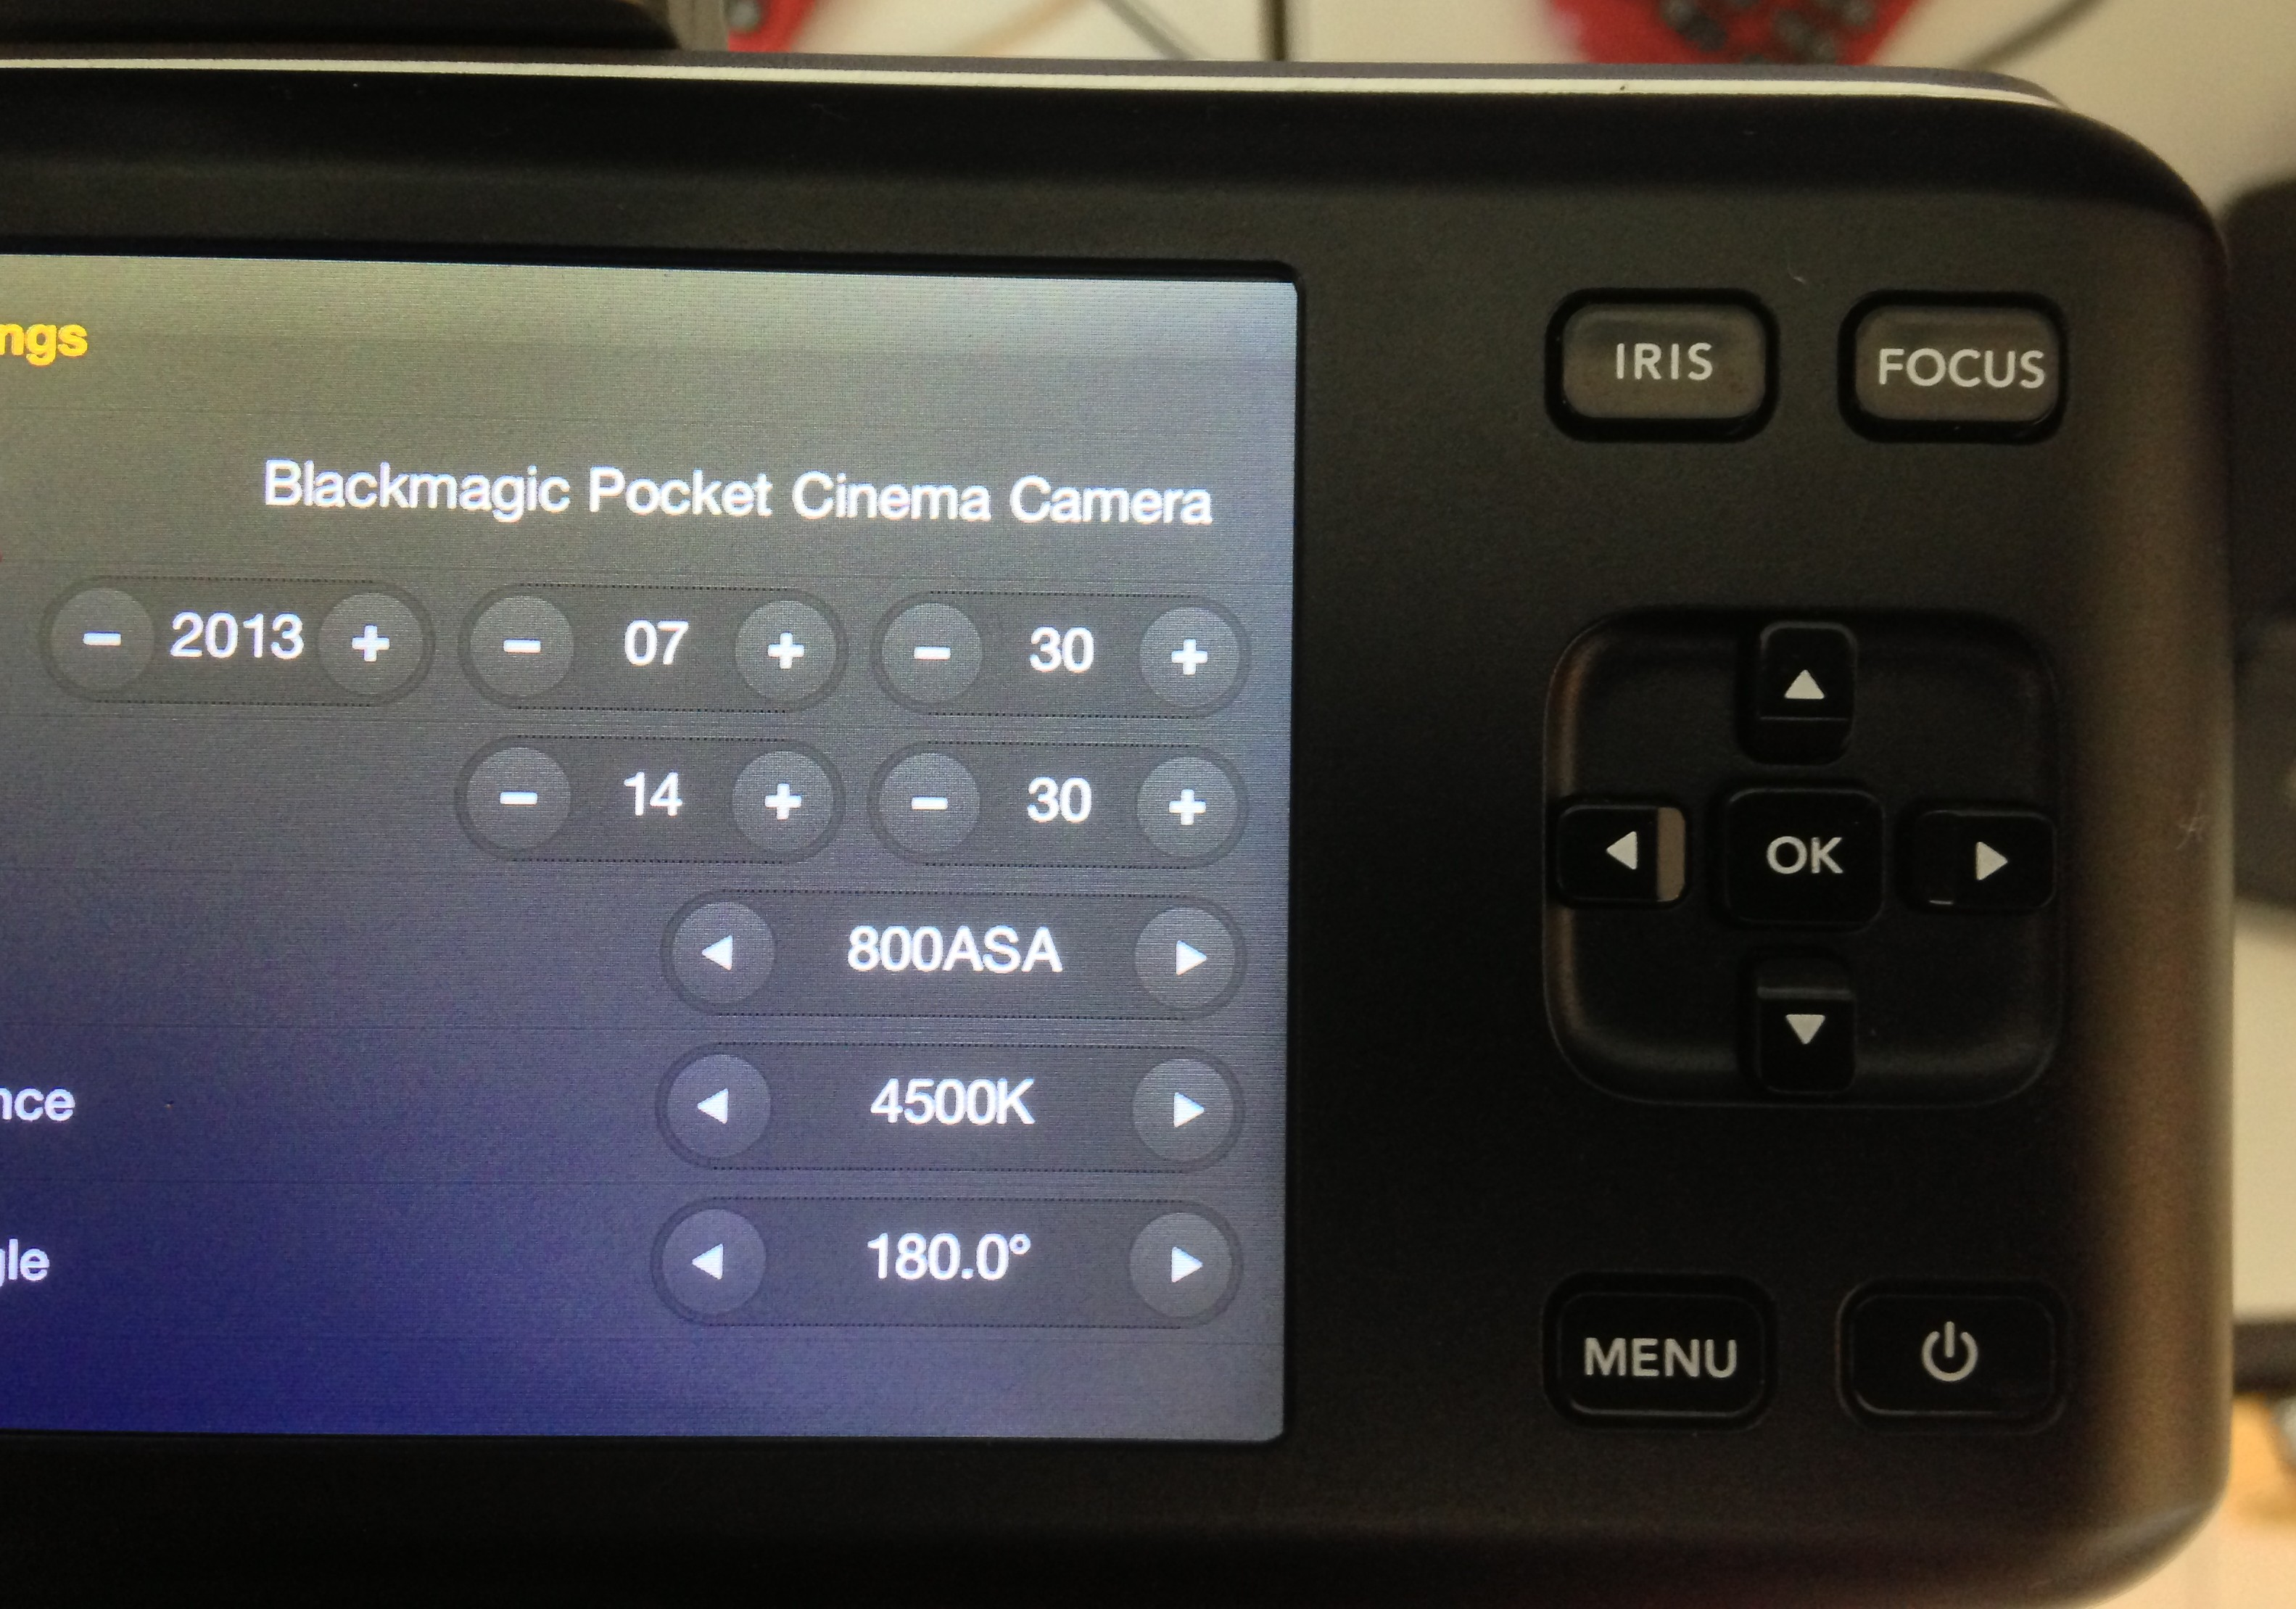 Blackmagic Pocket Cinema Camera night time testing at 1600ASA – and image quality issues